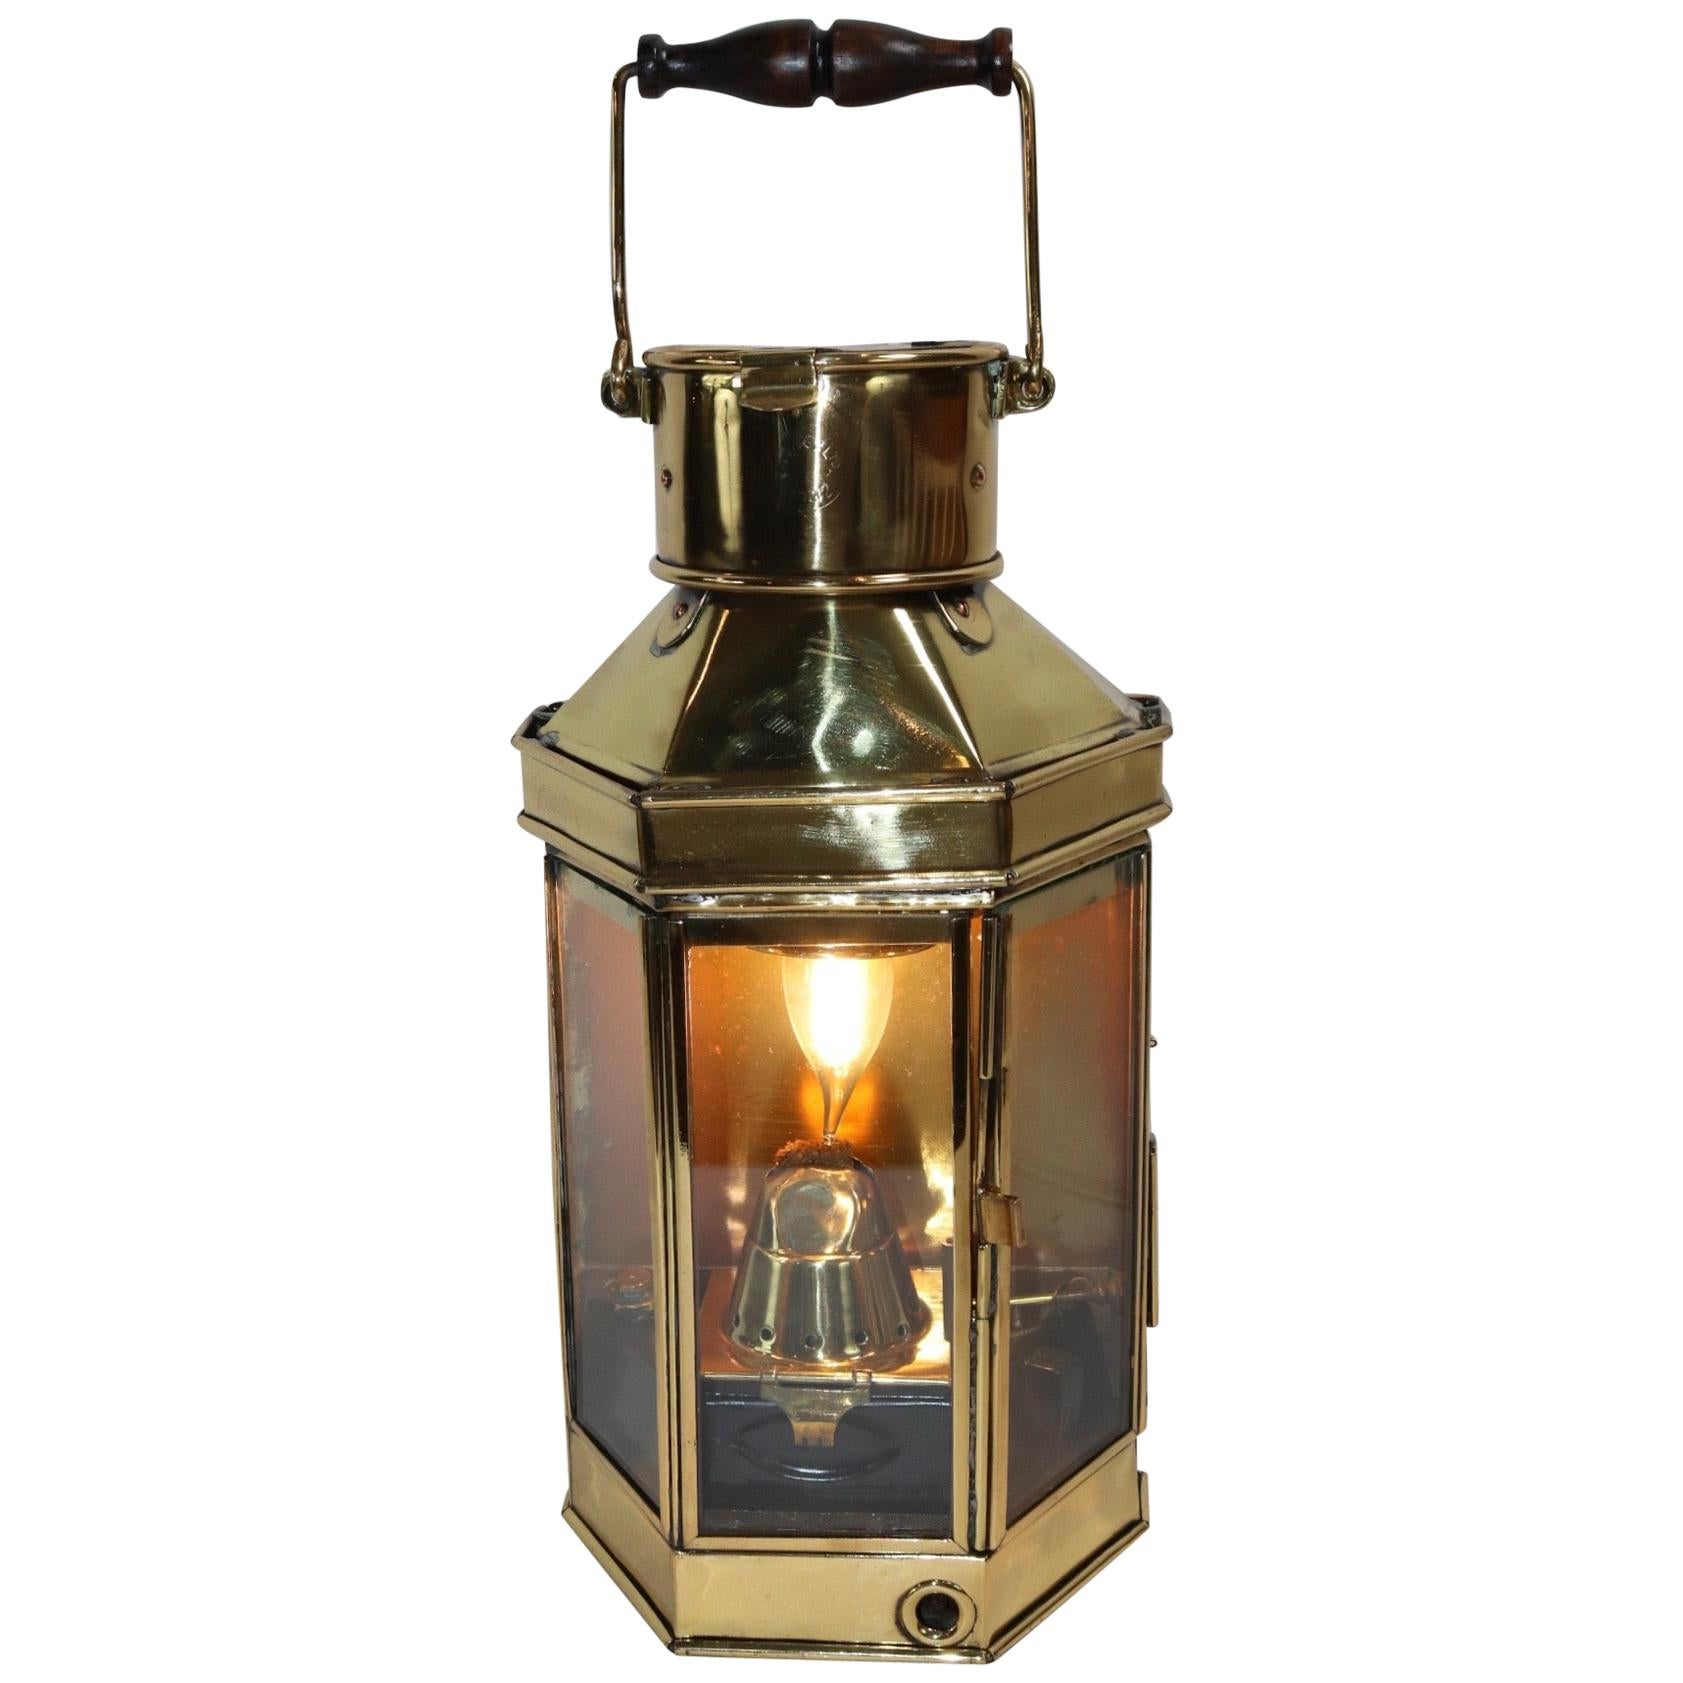 Solid Brass Ships Cabin Lantern by English Maker